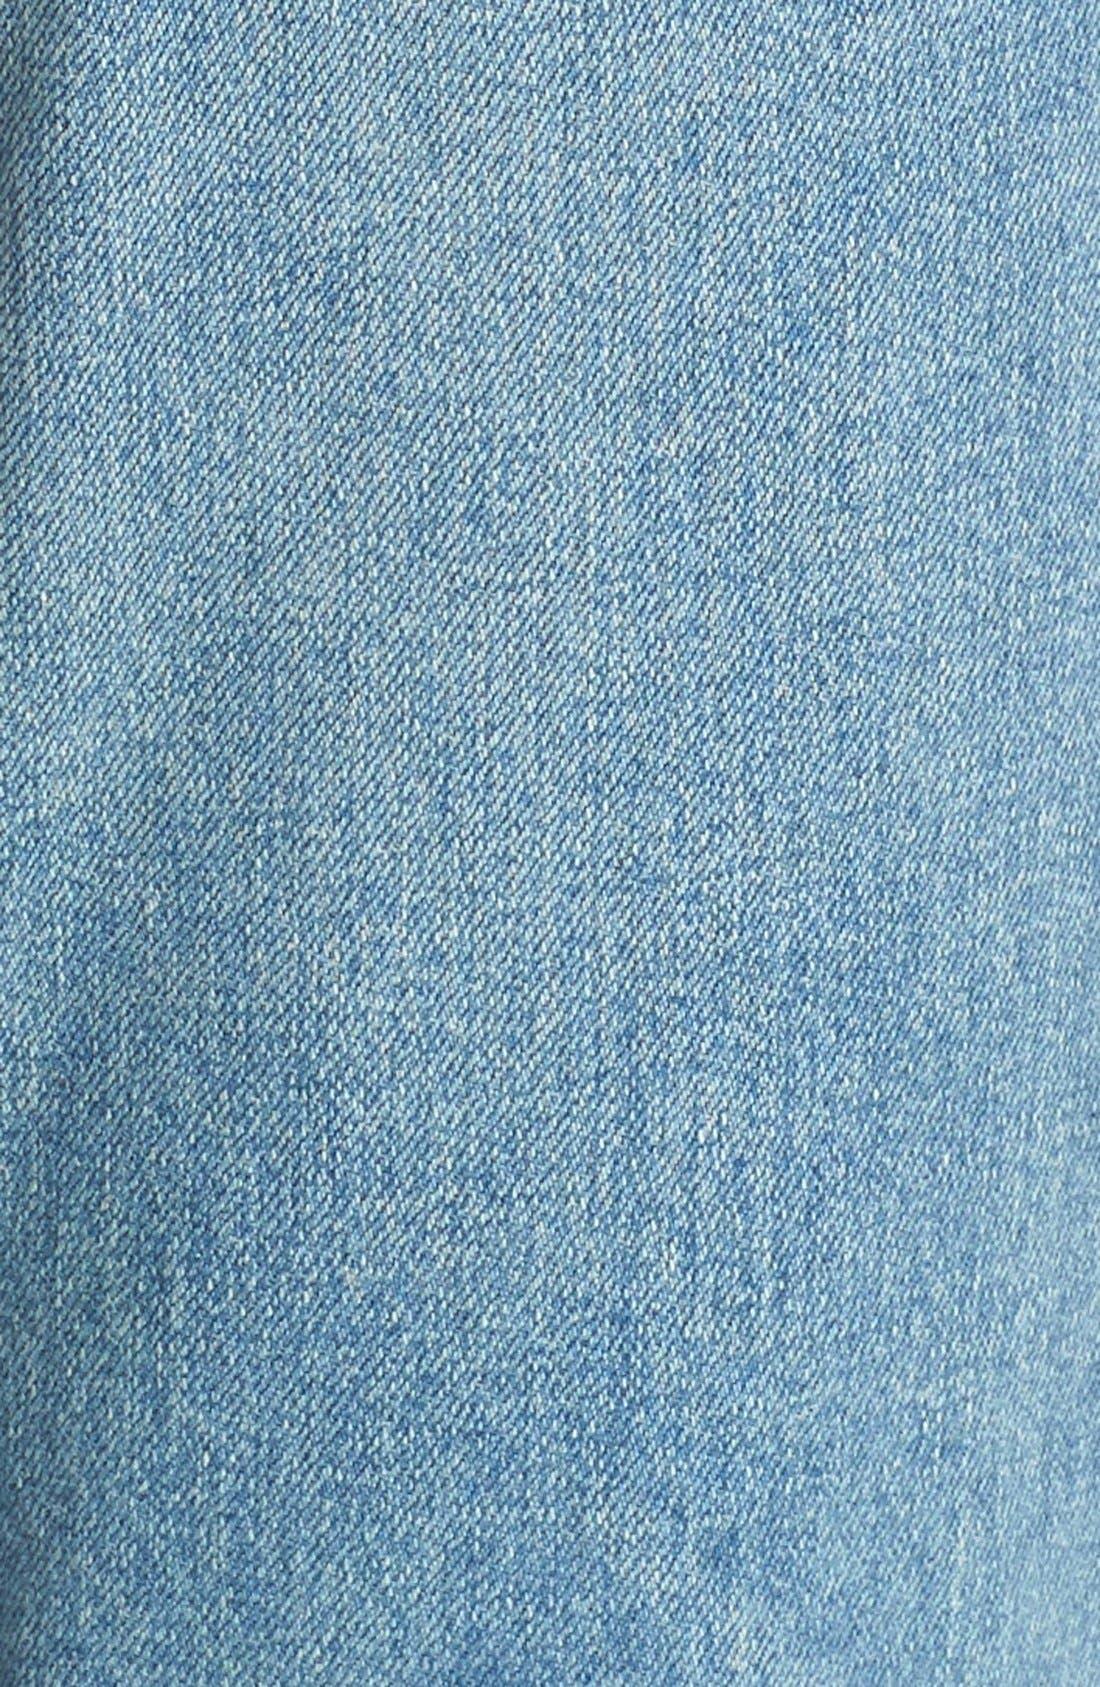 Originals High Rise Stretch Jeans,                             Alternate thumbnail 4, color,                             400